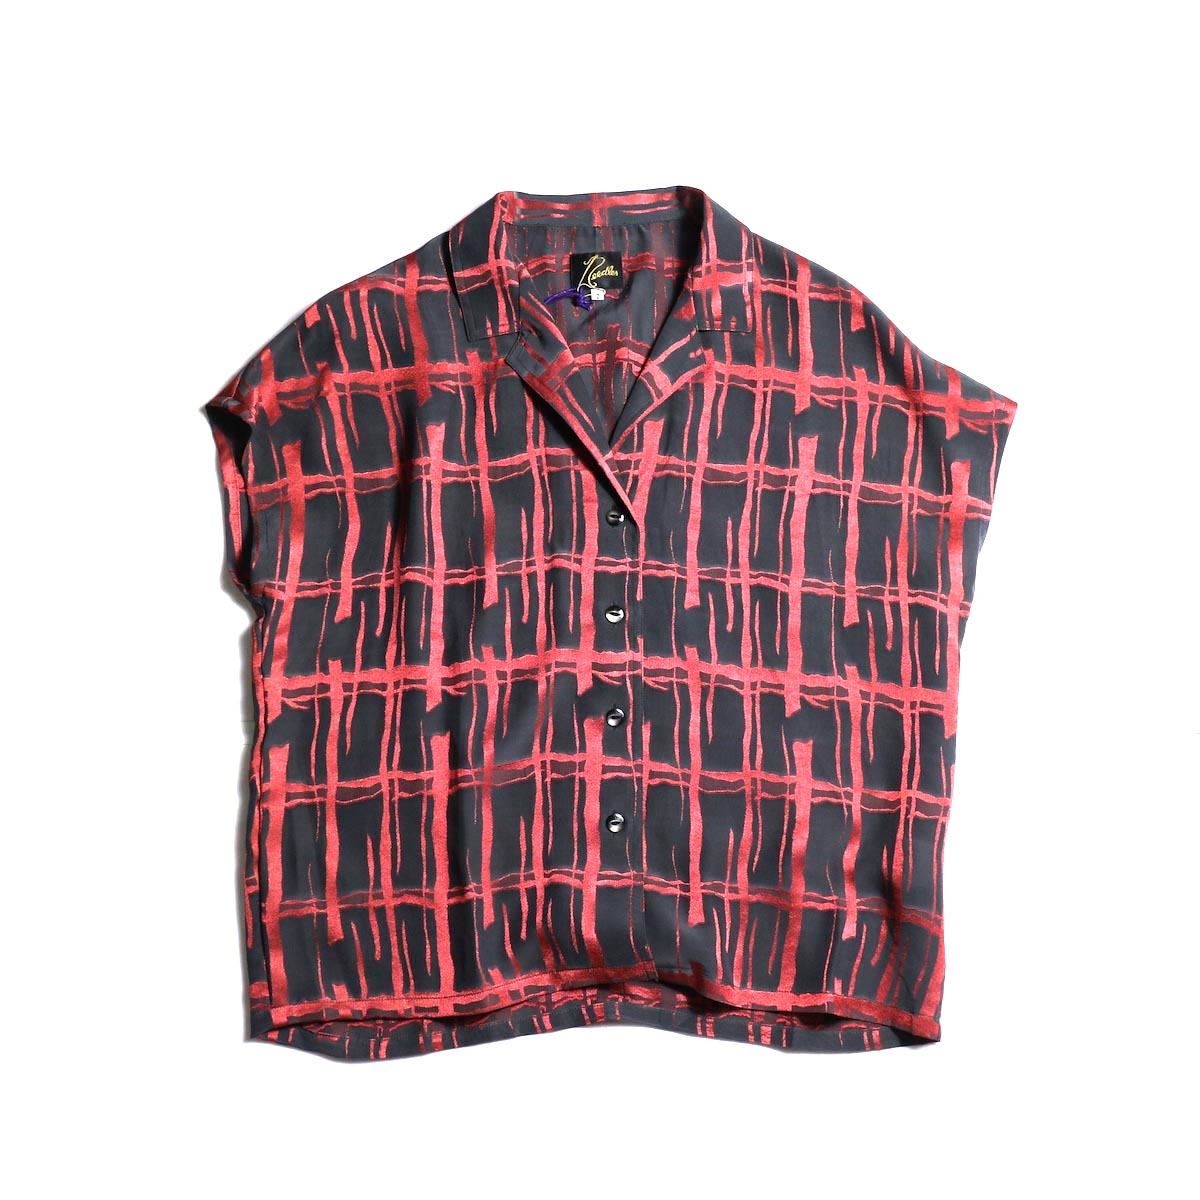 Needles / French Sleeve Blouse -Cu/Ac Jacquard / Plaid (Charcoal)